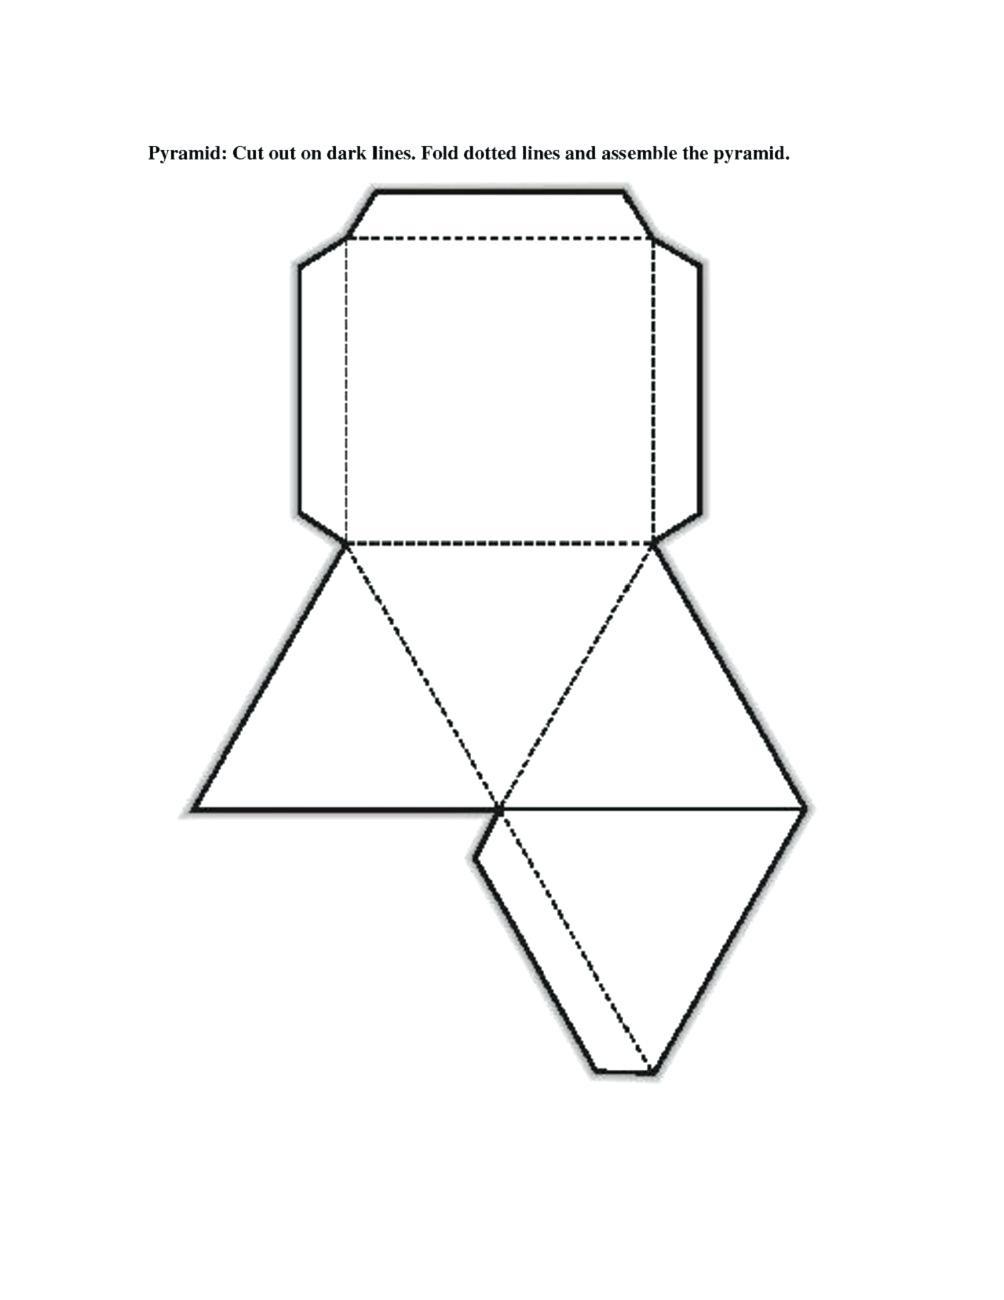 3 D Shape Printables Geometric Shapes To Print 3D Shape Printables - Free Printable Shapes Templates